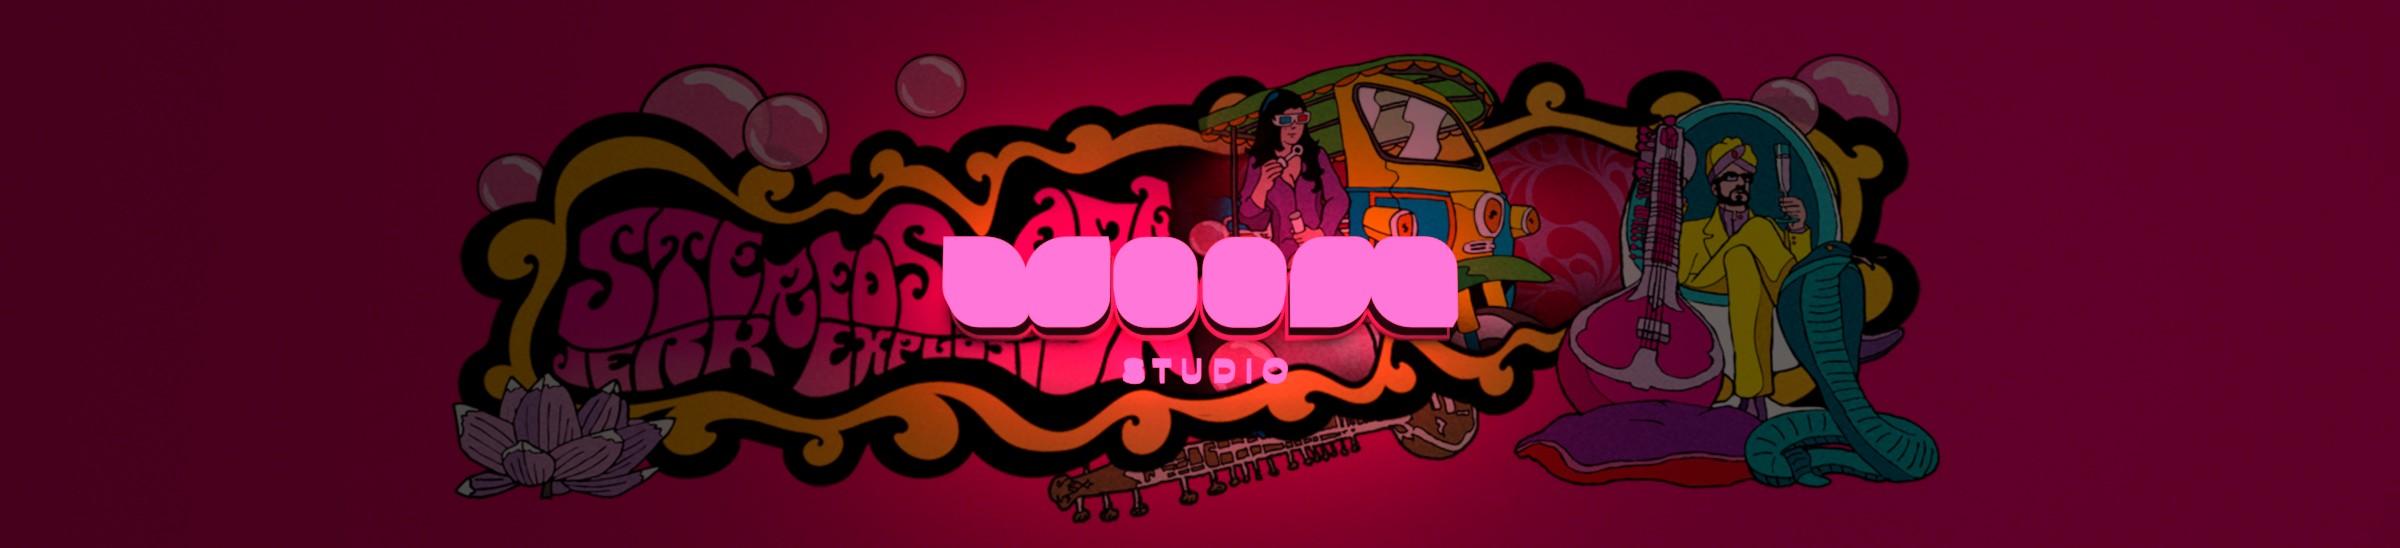 Woom-stereoscope-02